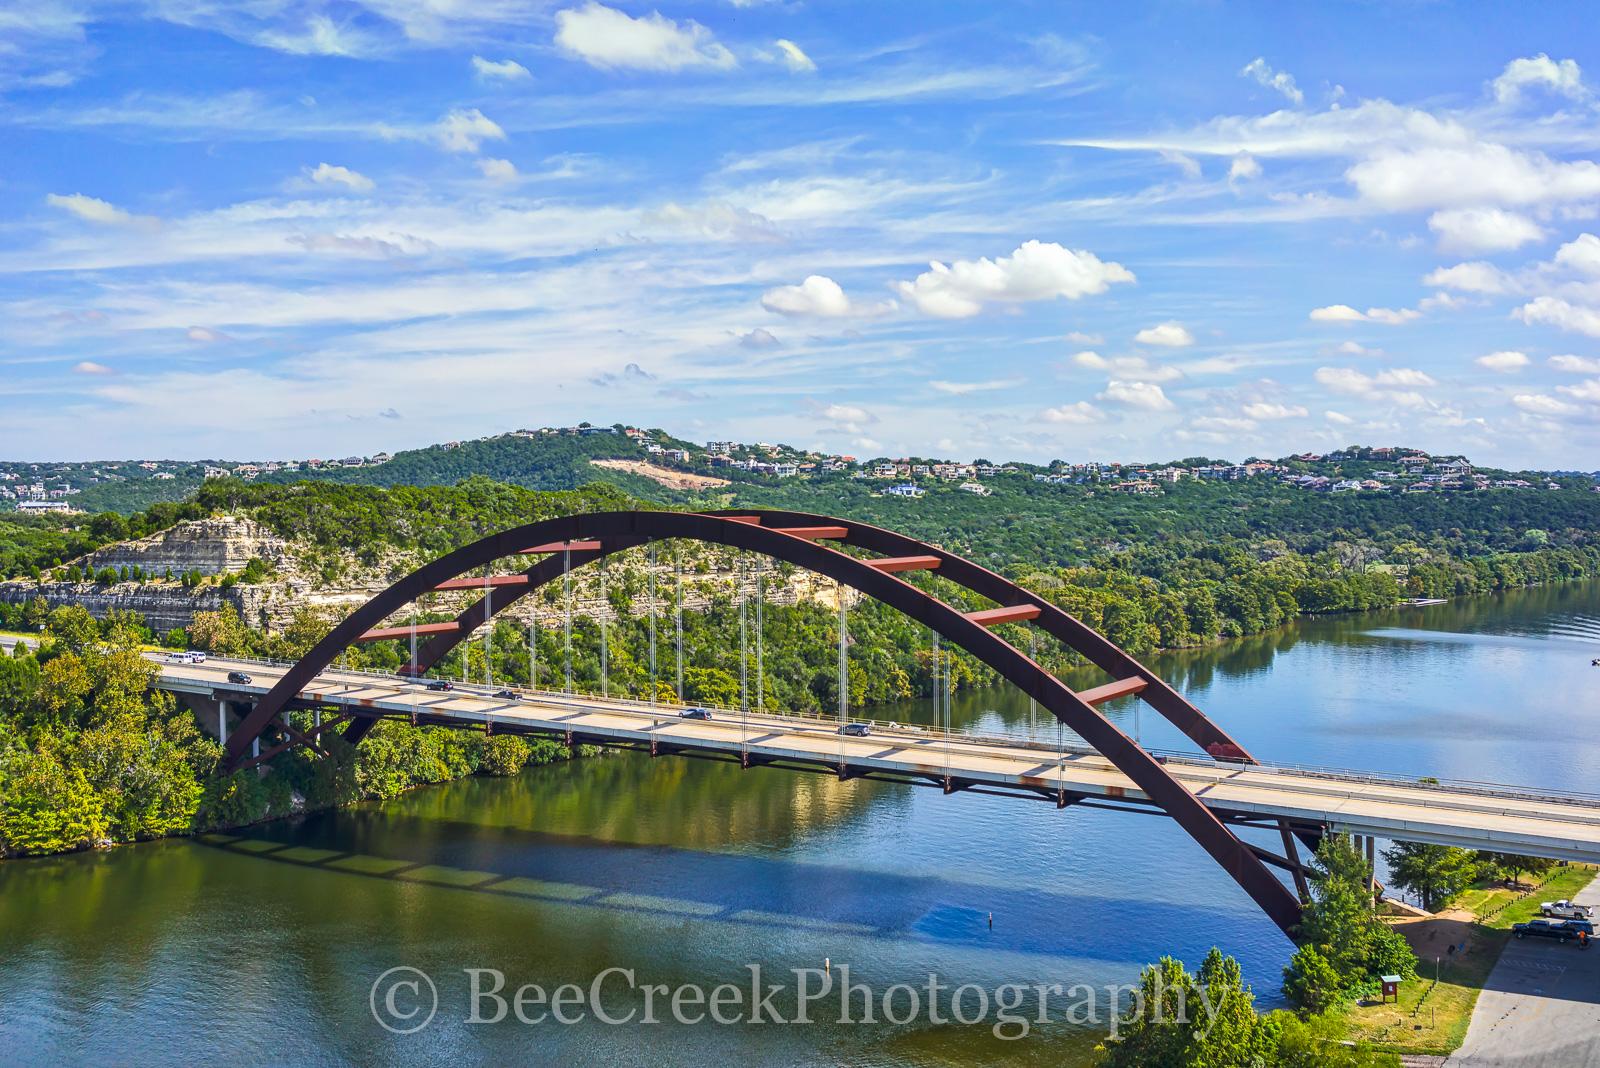 Austin, Pennybacker Bridge, 360 Bridge, Lake Austin, cityscape, over austin, architecture, architectural, water, boat, reflections, images of austin, photos of austin, pictures of austin, images of 36, photo